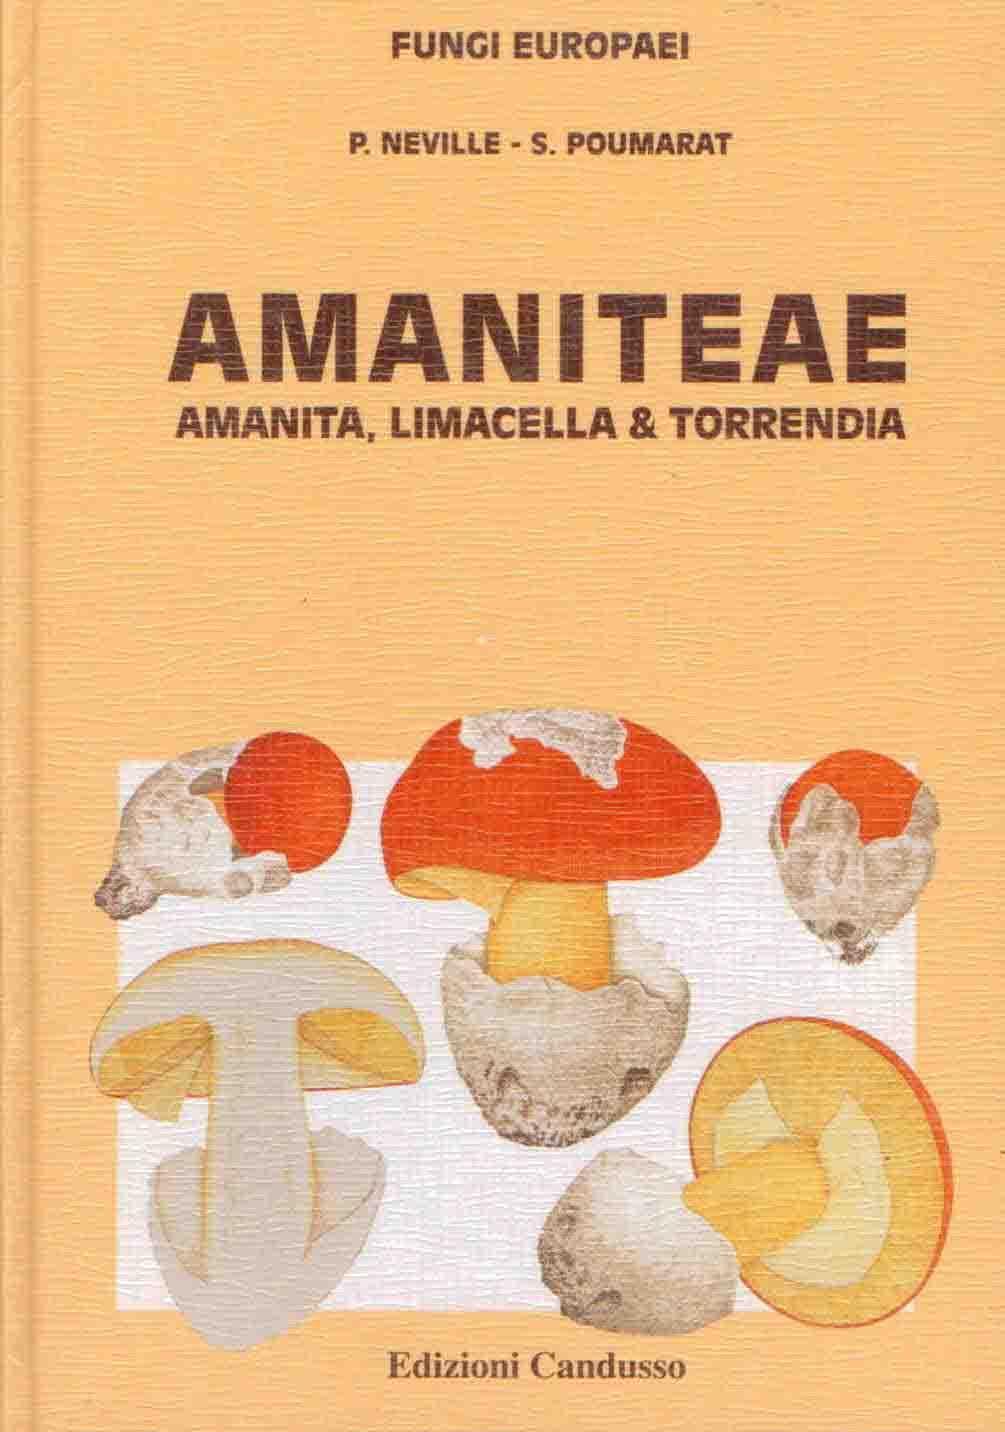 Fungi europaei